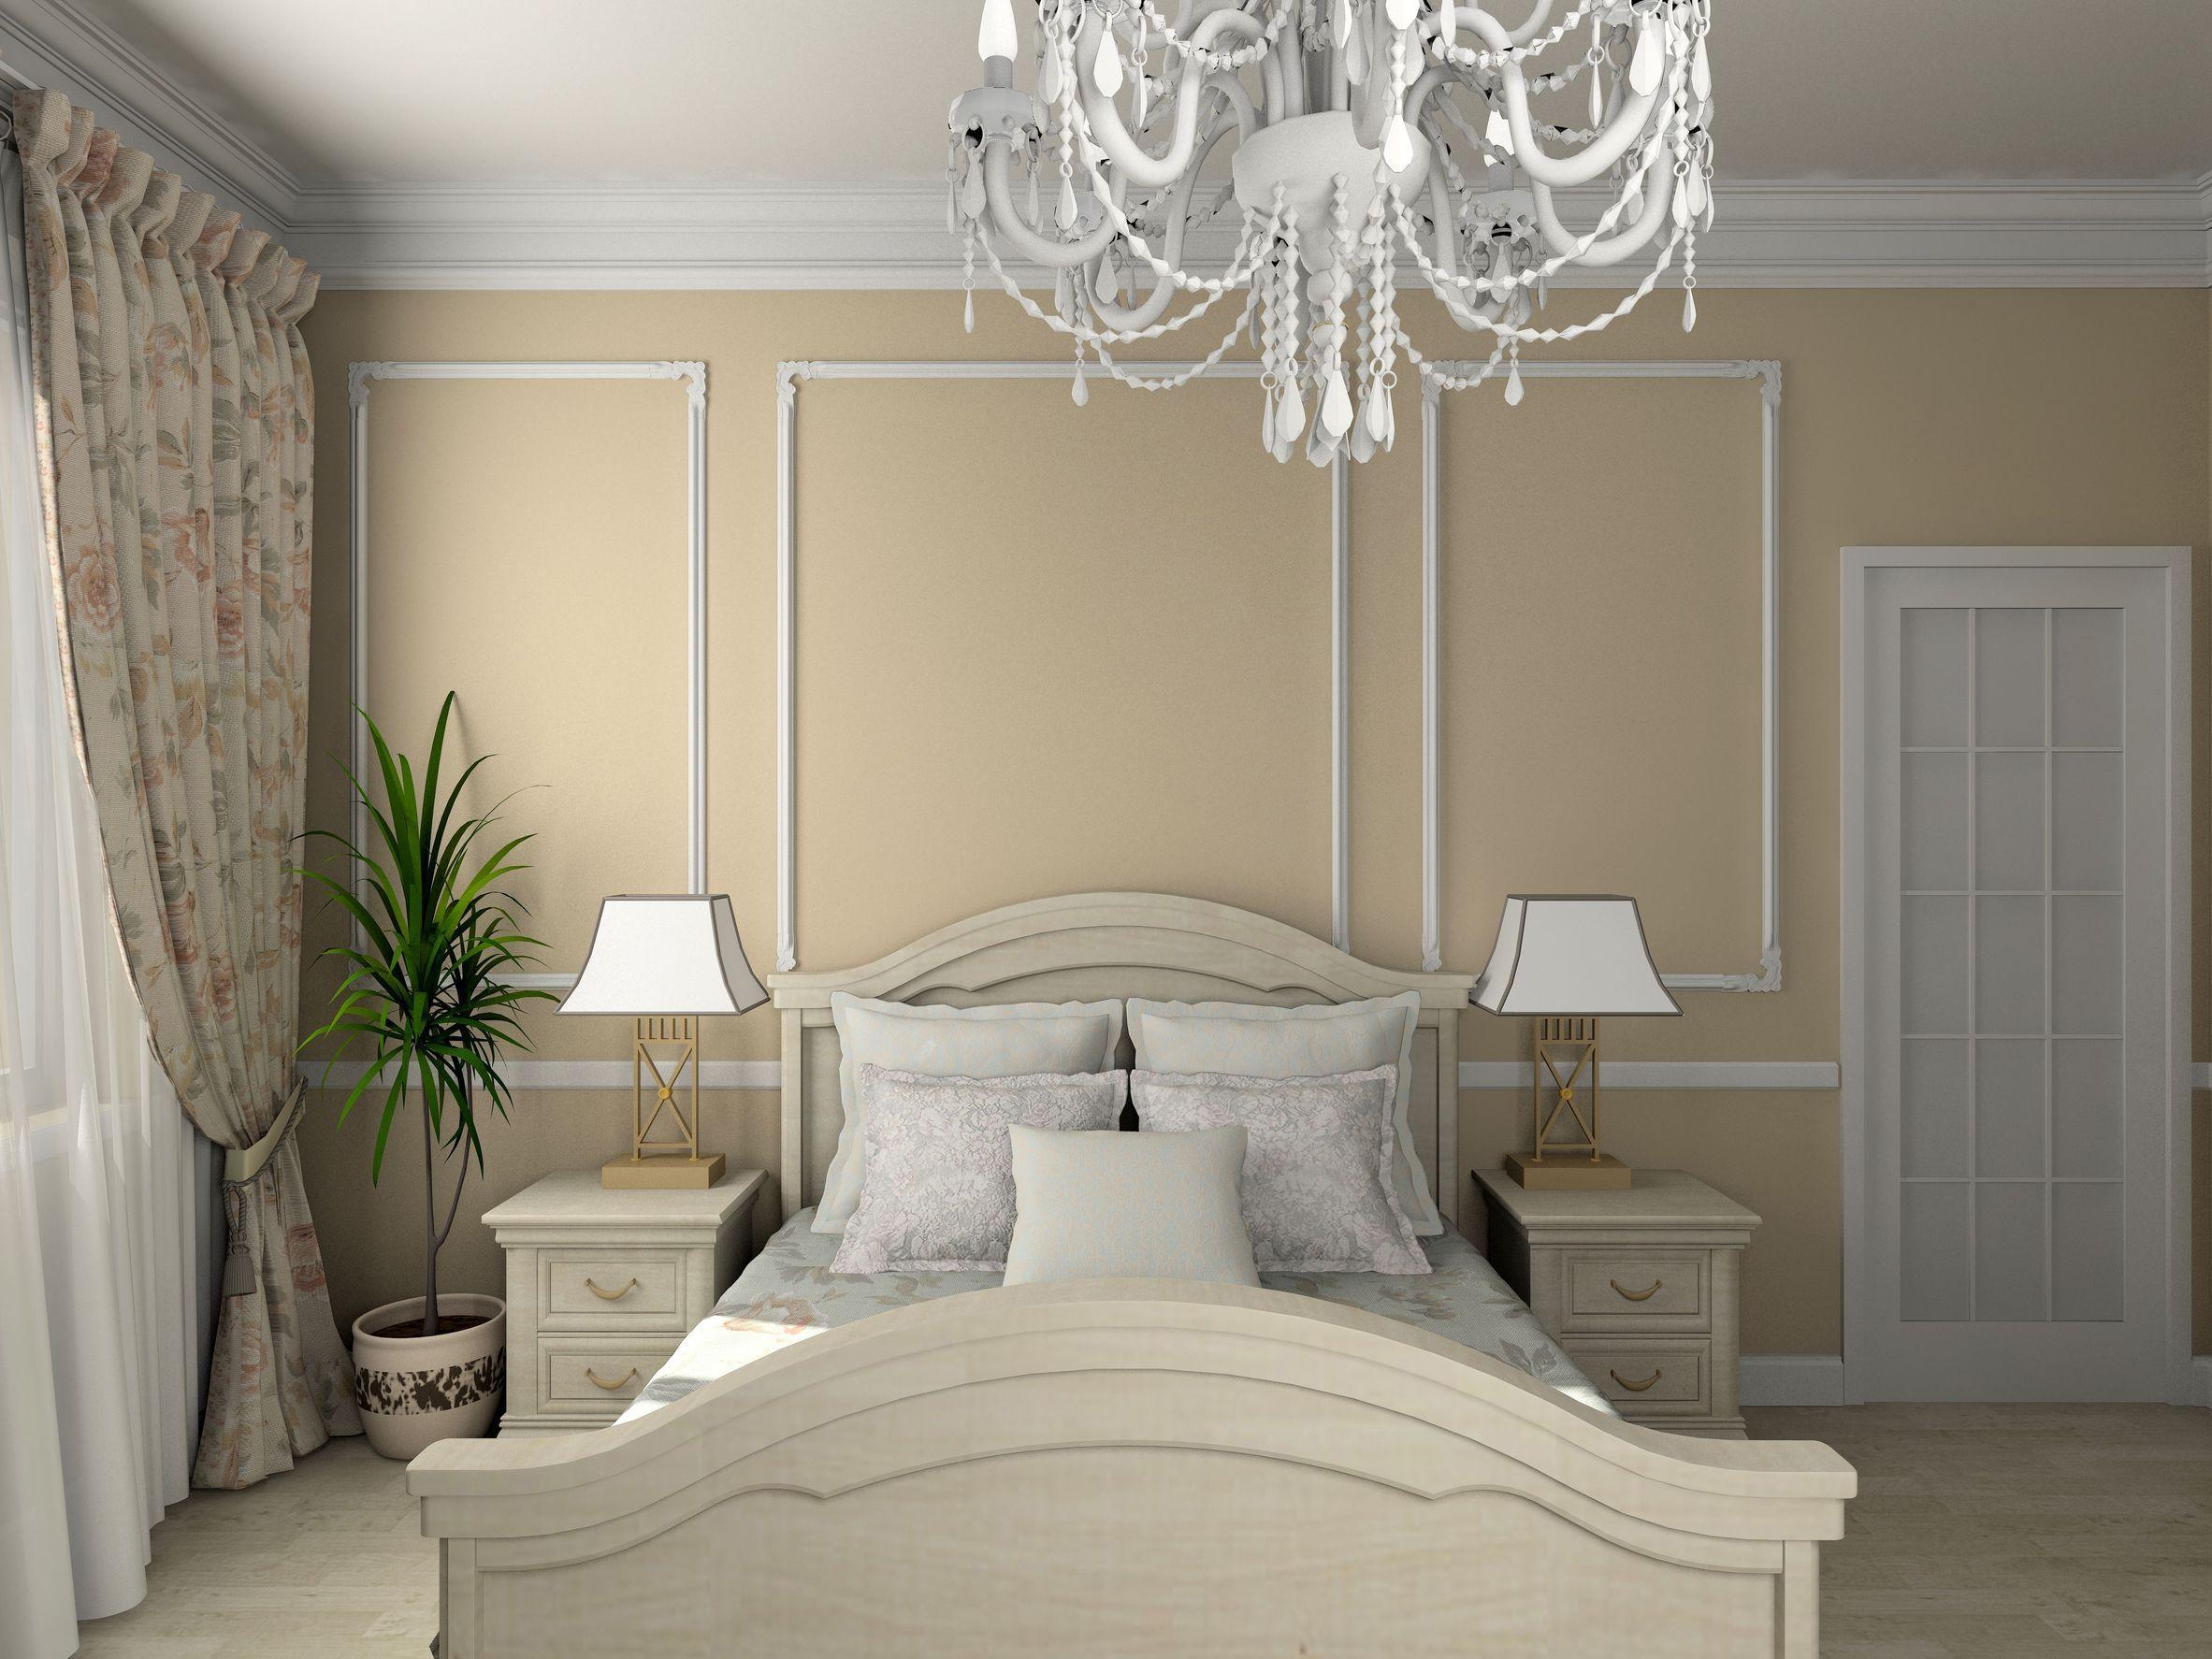 Calming Paint Colors for Bedroom - http://www.amazadesign.com ...